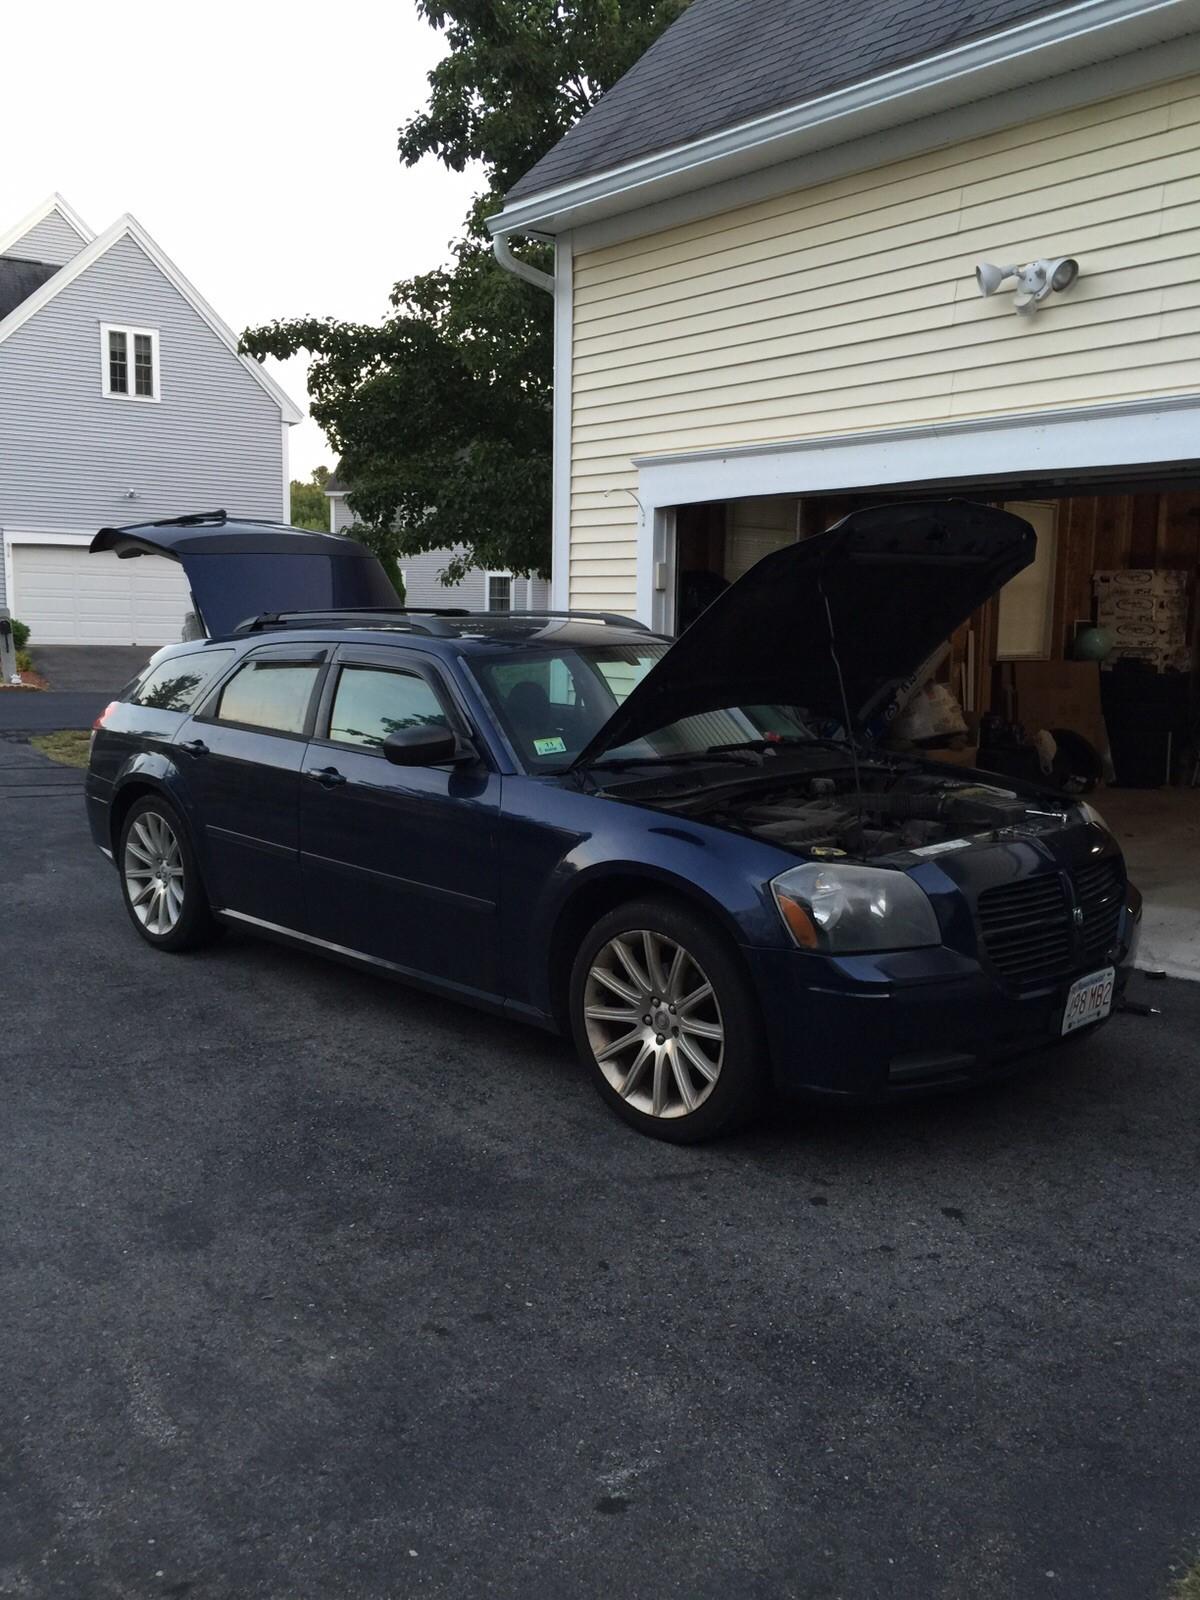 2006 Dodge Charger Rt: Cash For Cars Joplin, MO